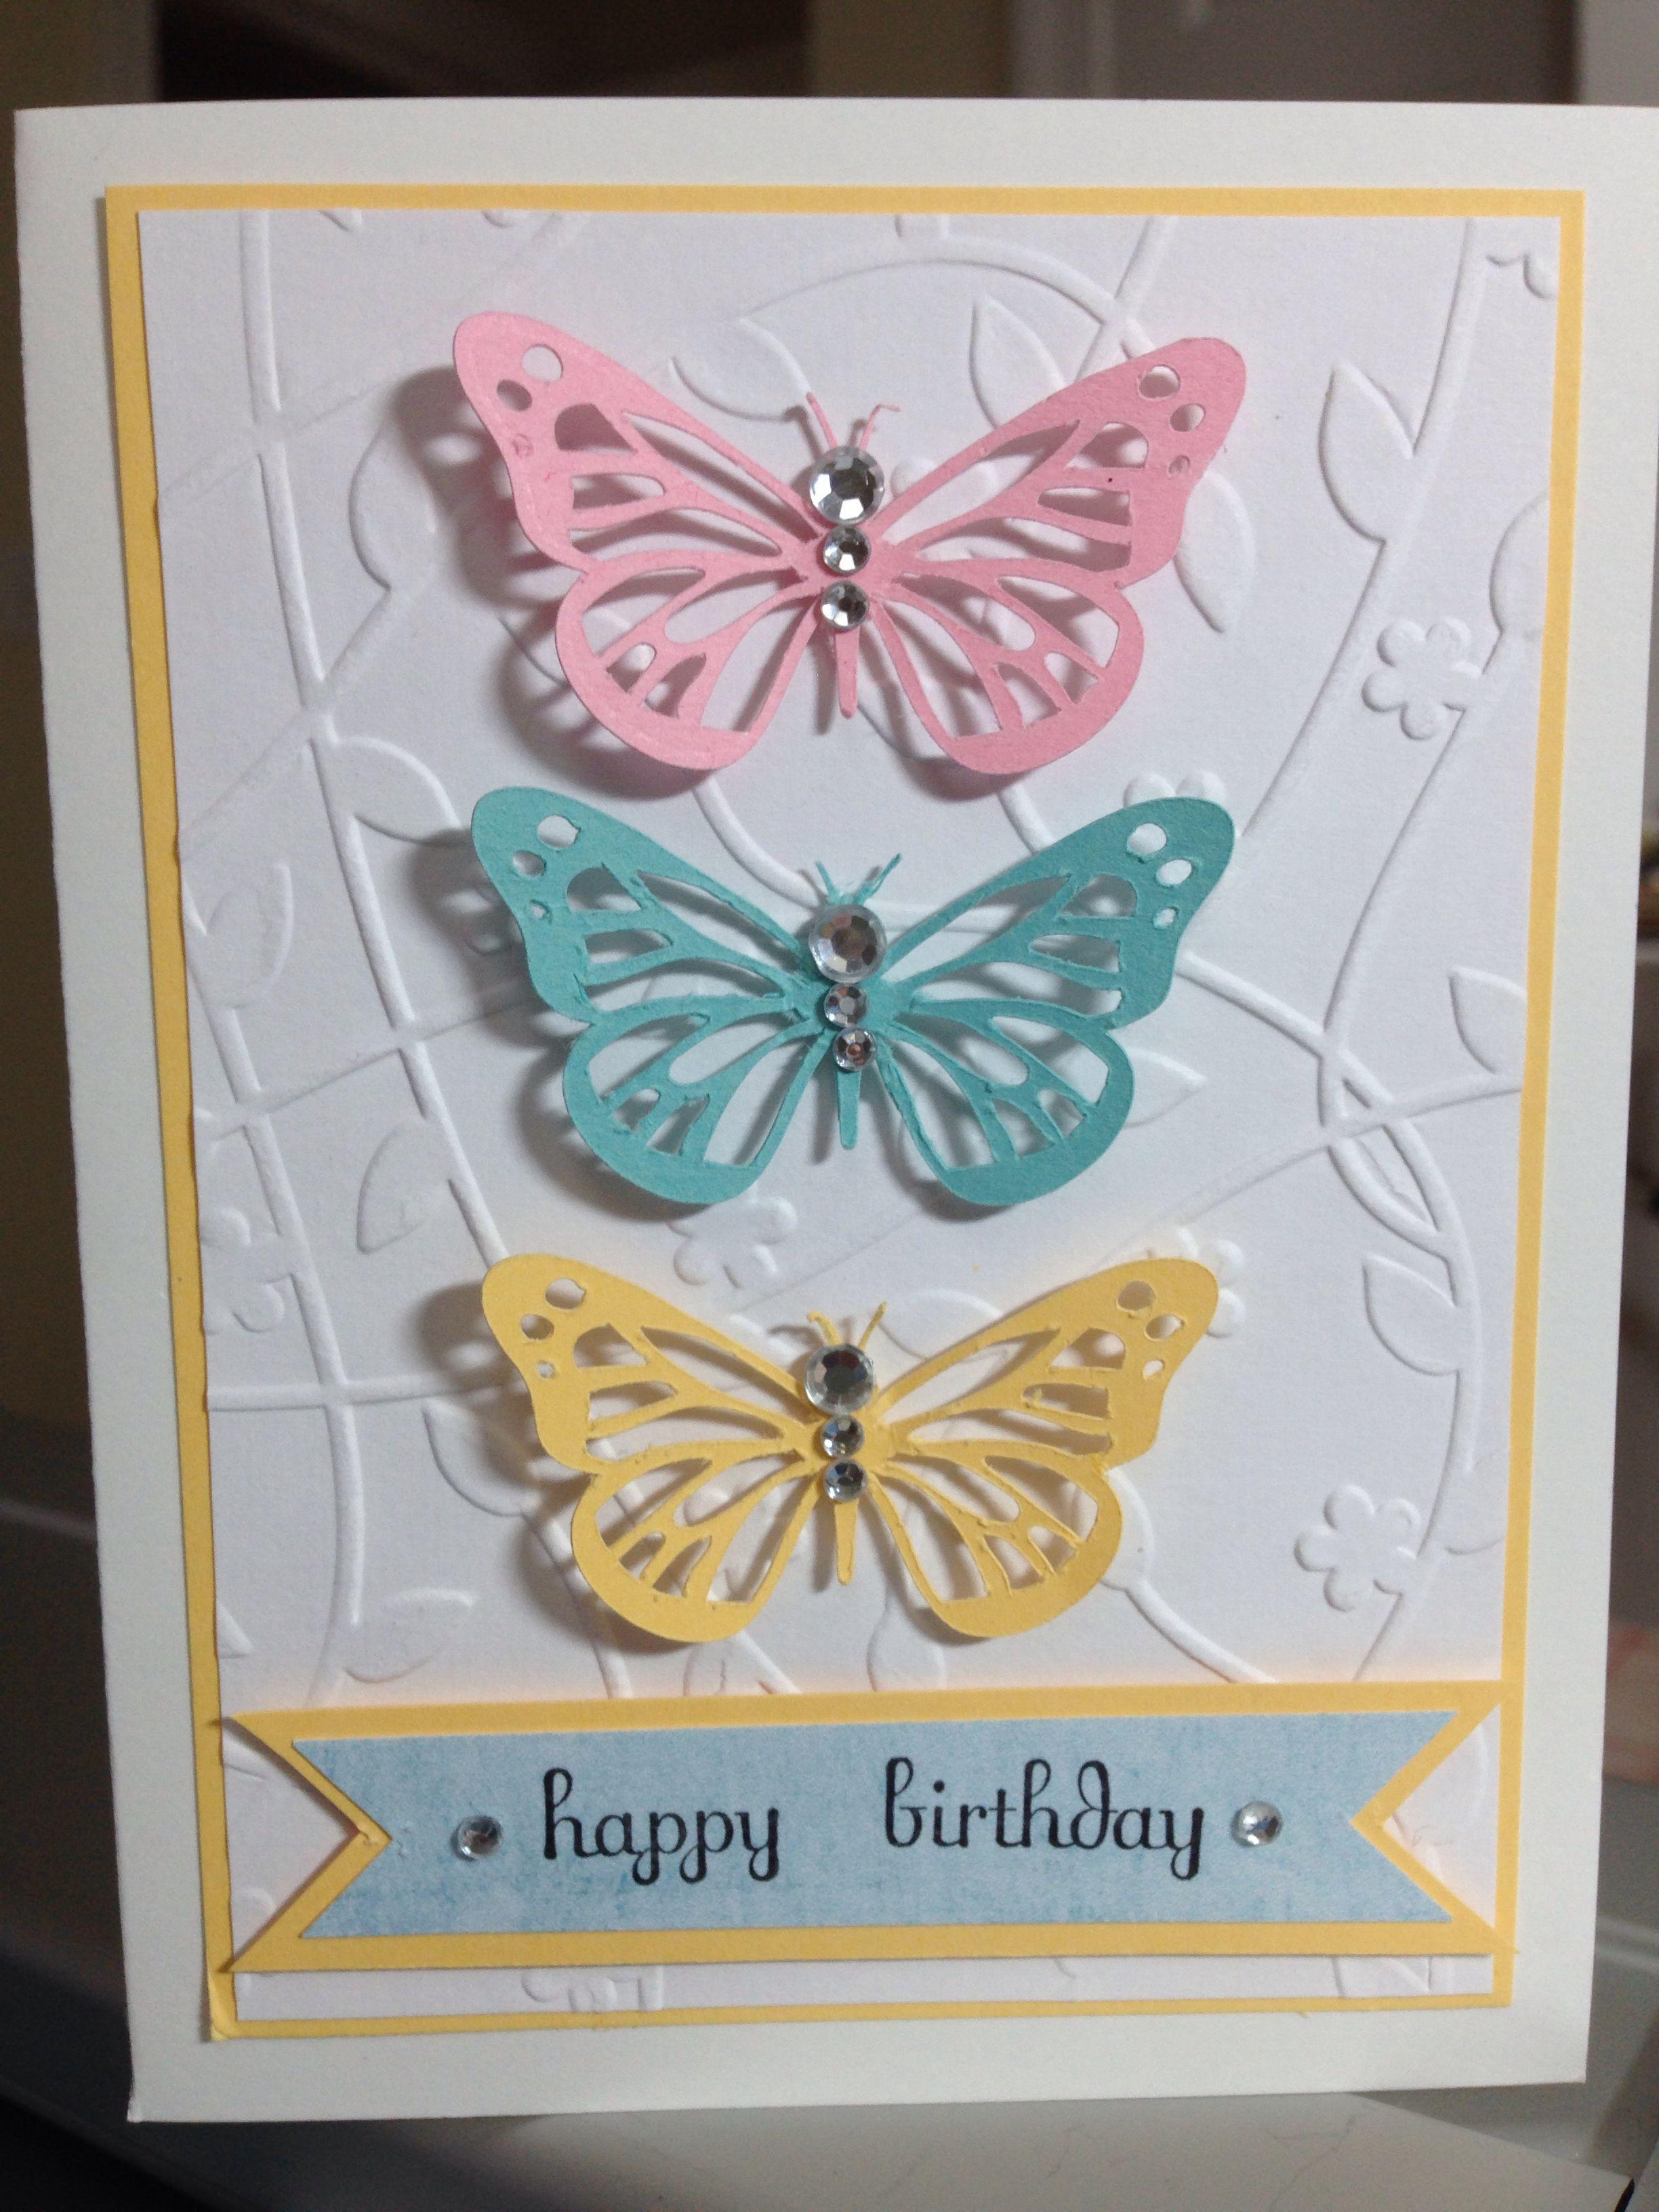 Butterfly Birthday Card Butterfly Birthday Cards Birthday Cards Birthday Cards For Women